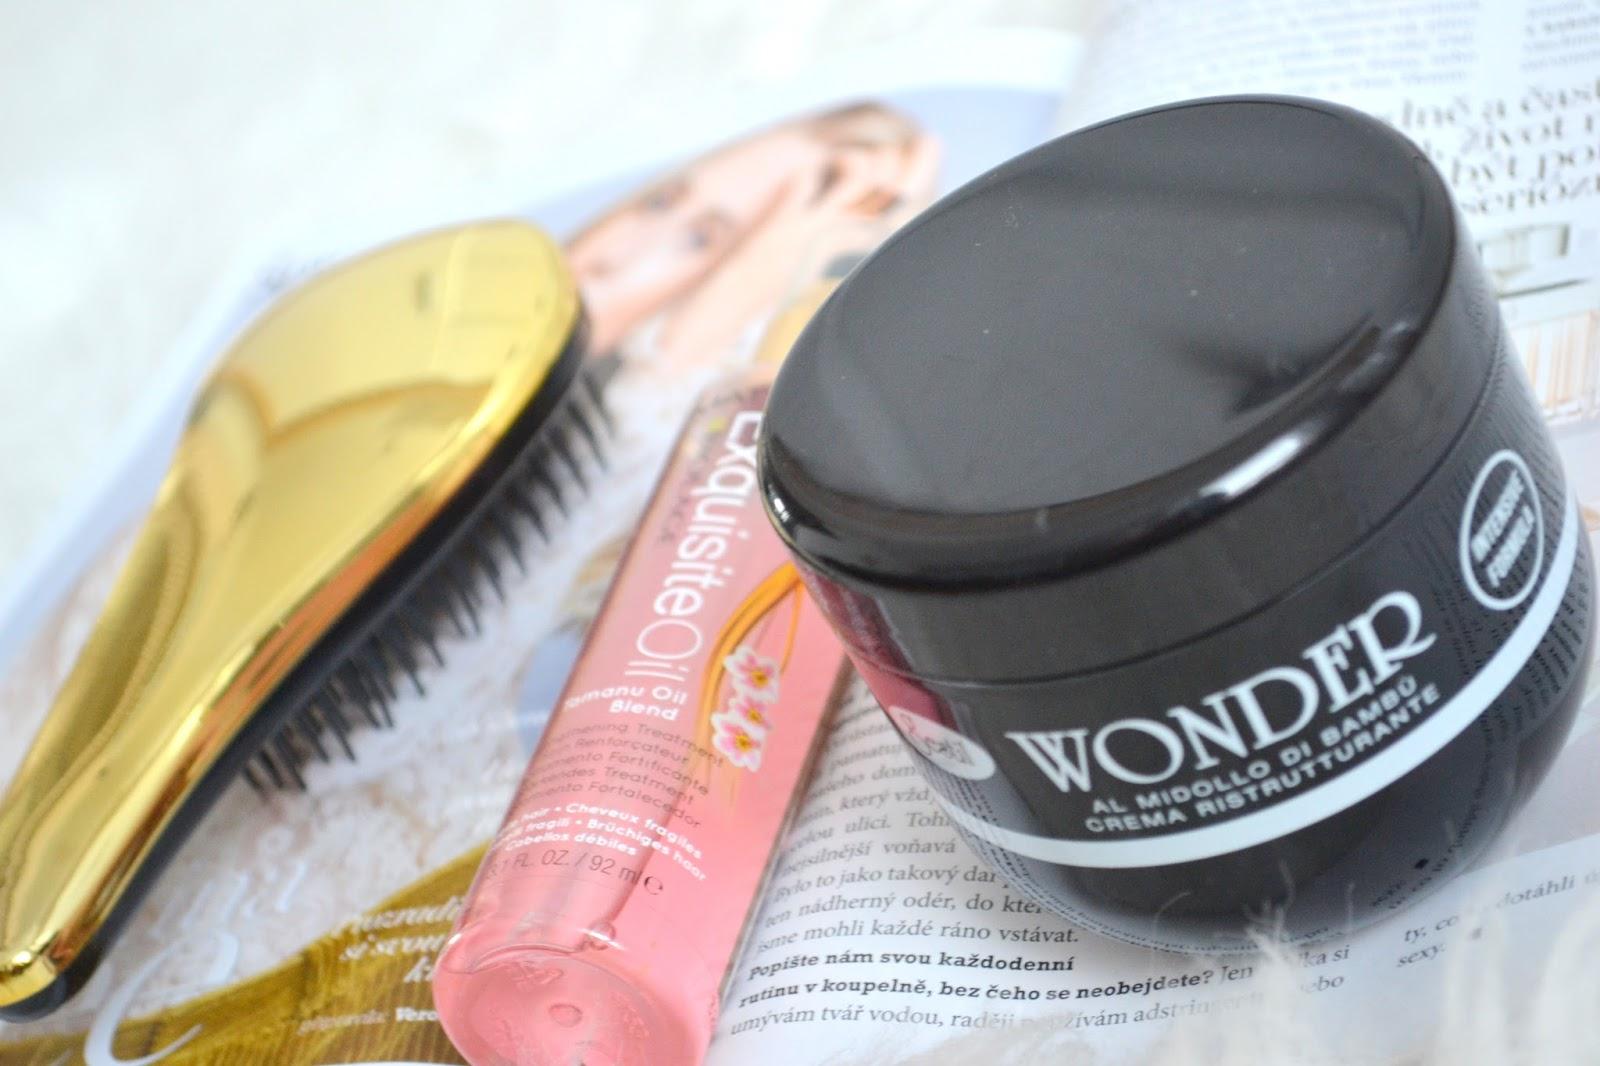 Gestil Wonder je jedinečný vlasový balzam 0bd733f0892